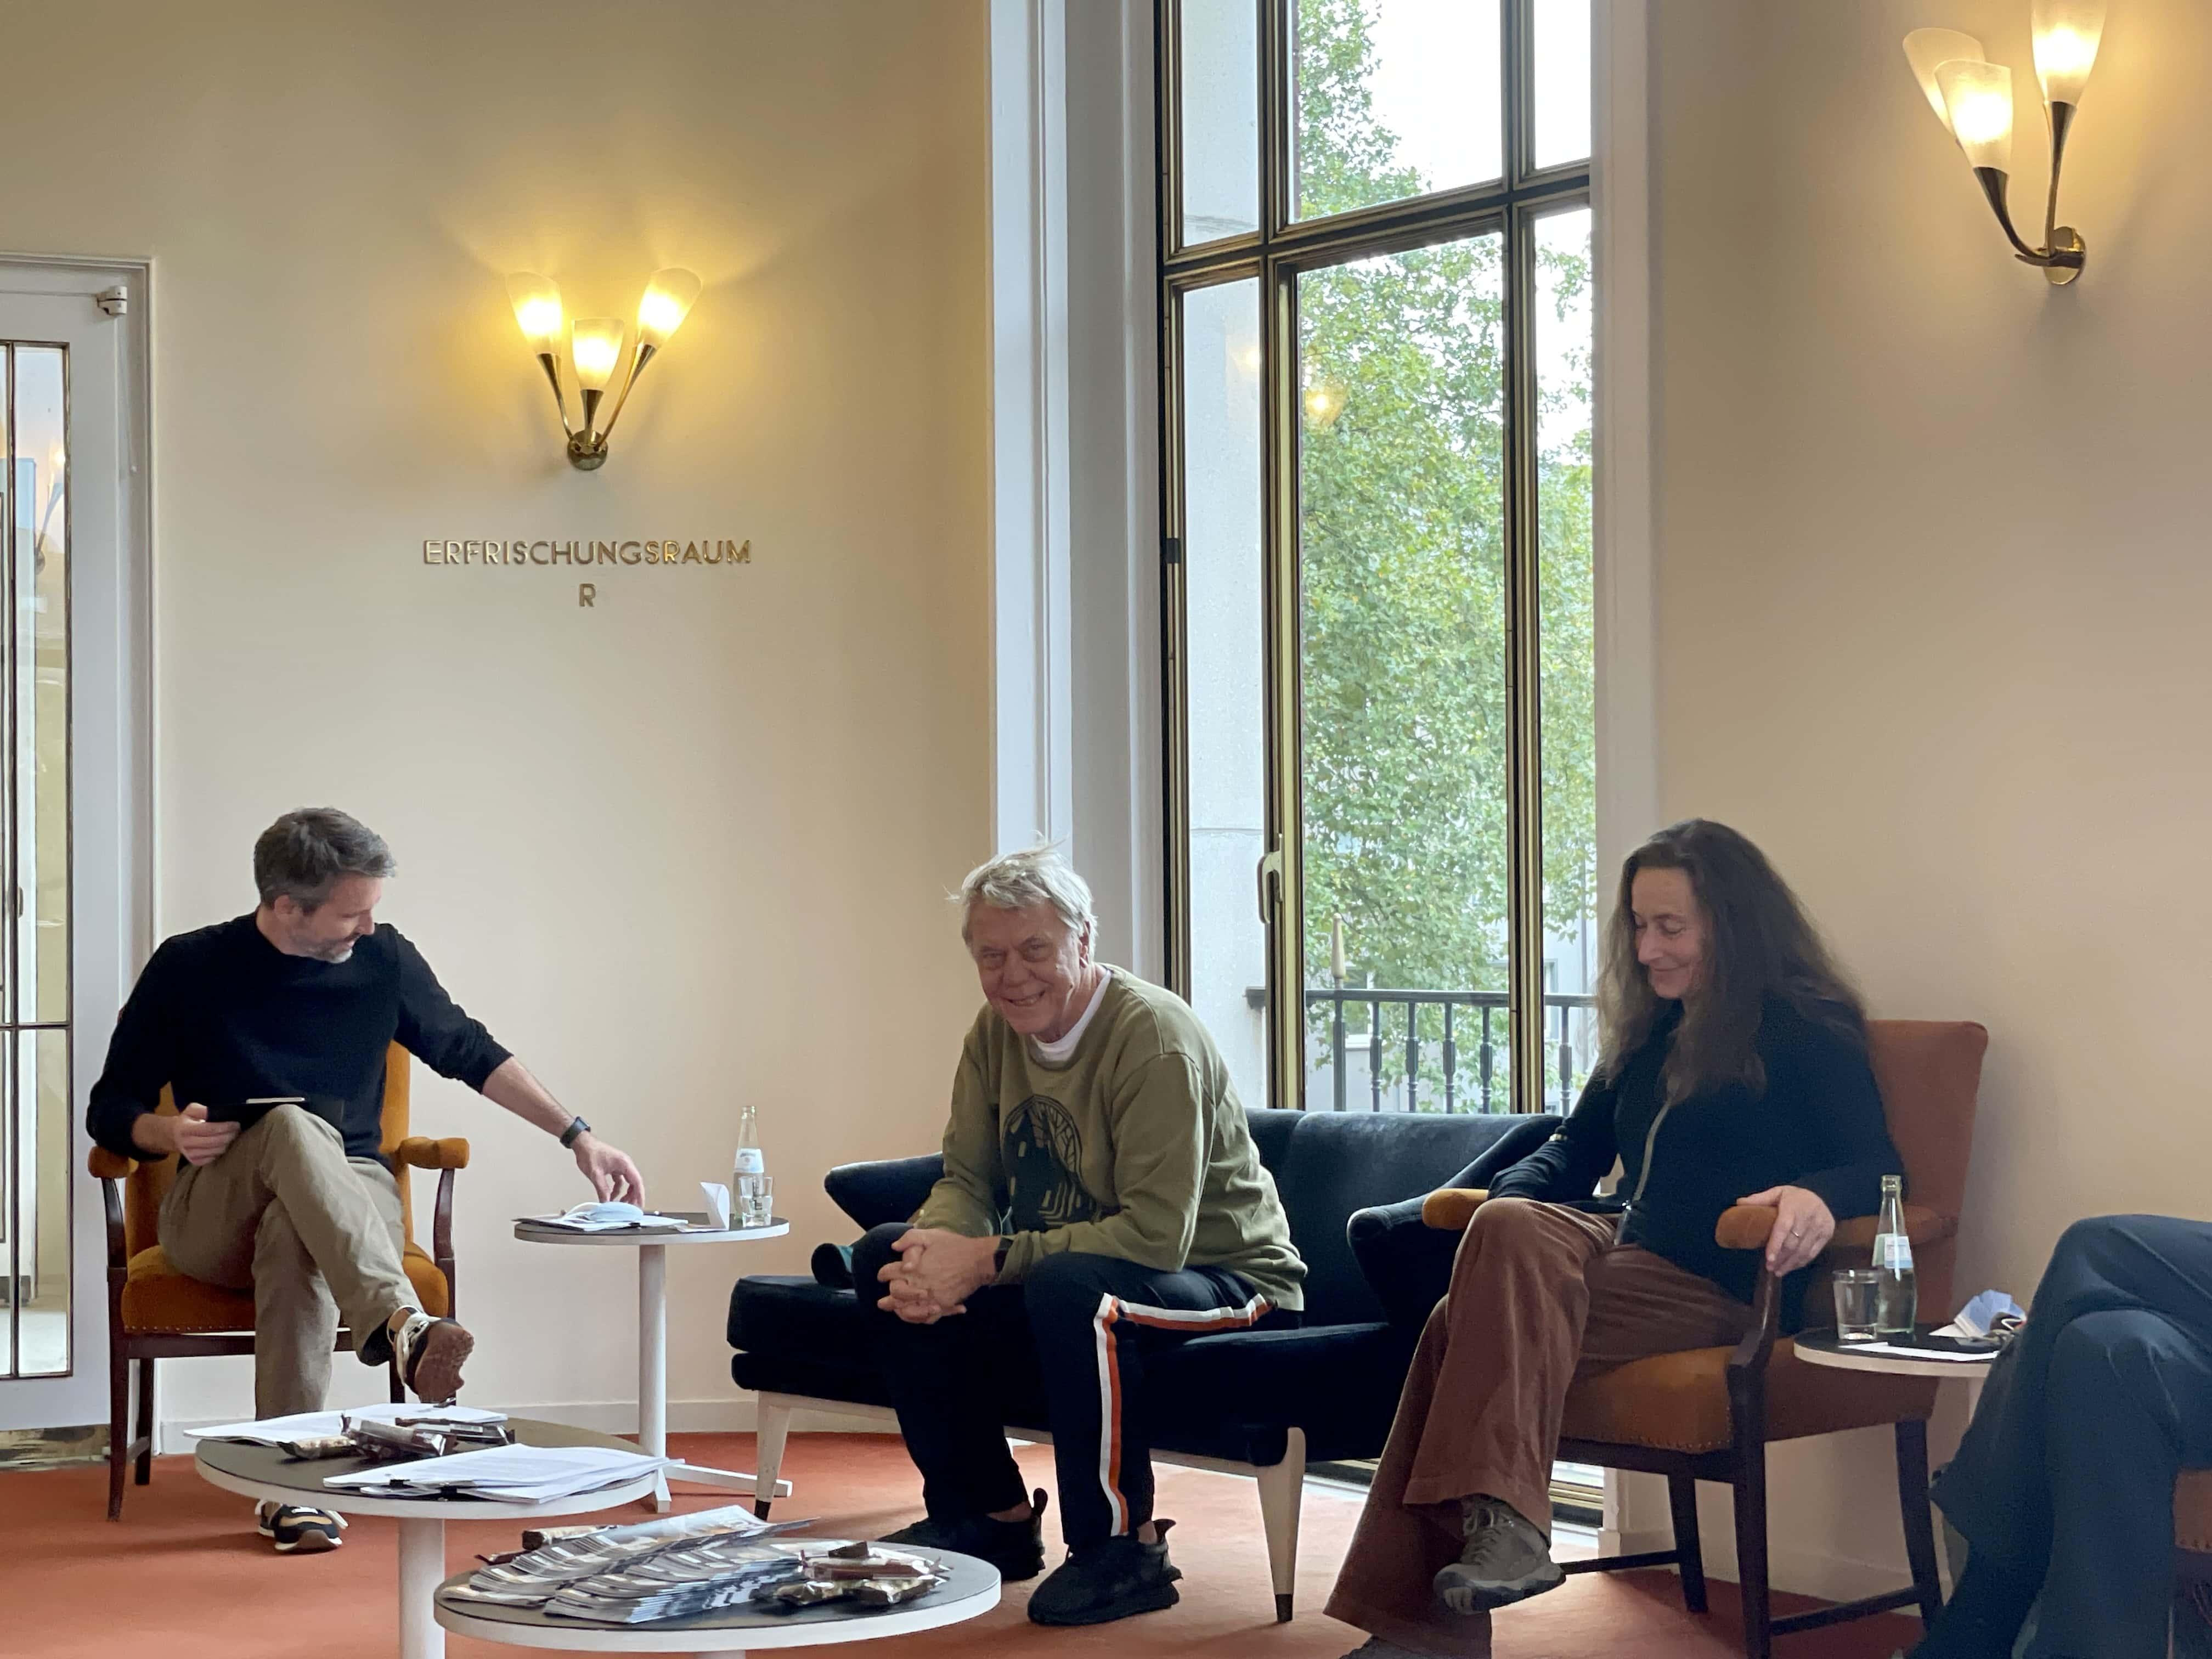 Schauspielhaus Bochum (Pressekonferenz zu den Oktober-Premieren): Alexander Kruse, Johan Simons, Susanne Winnacker